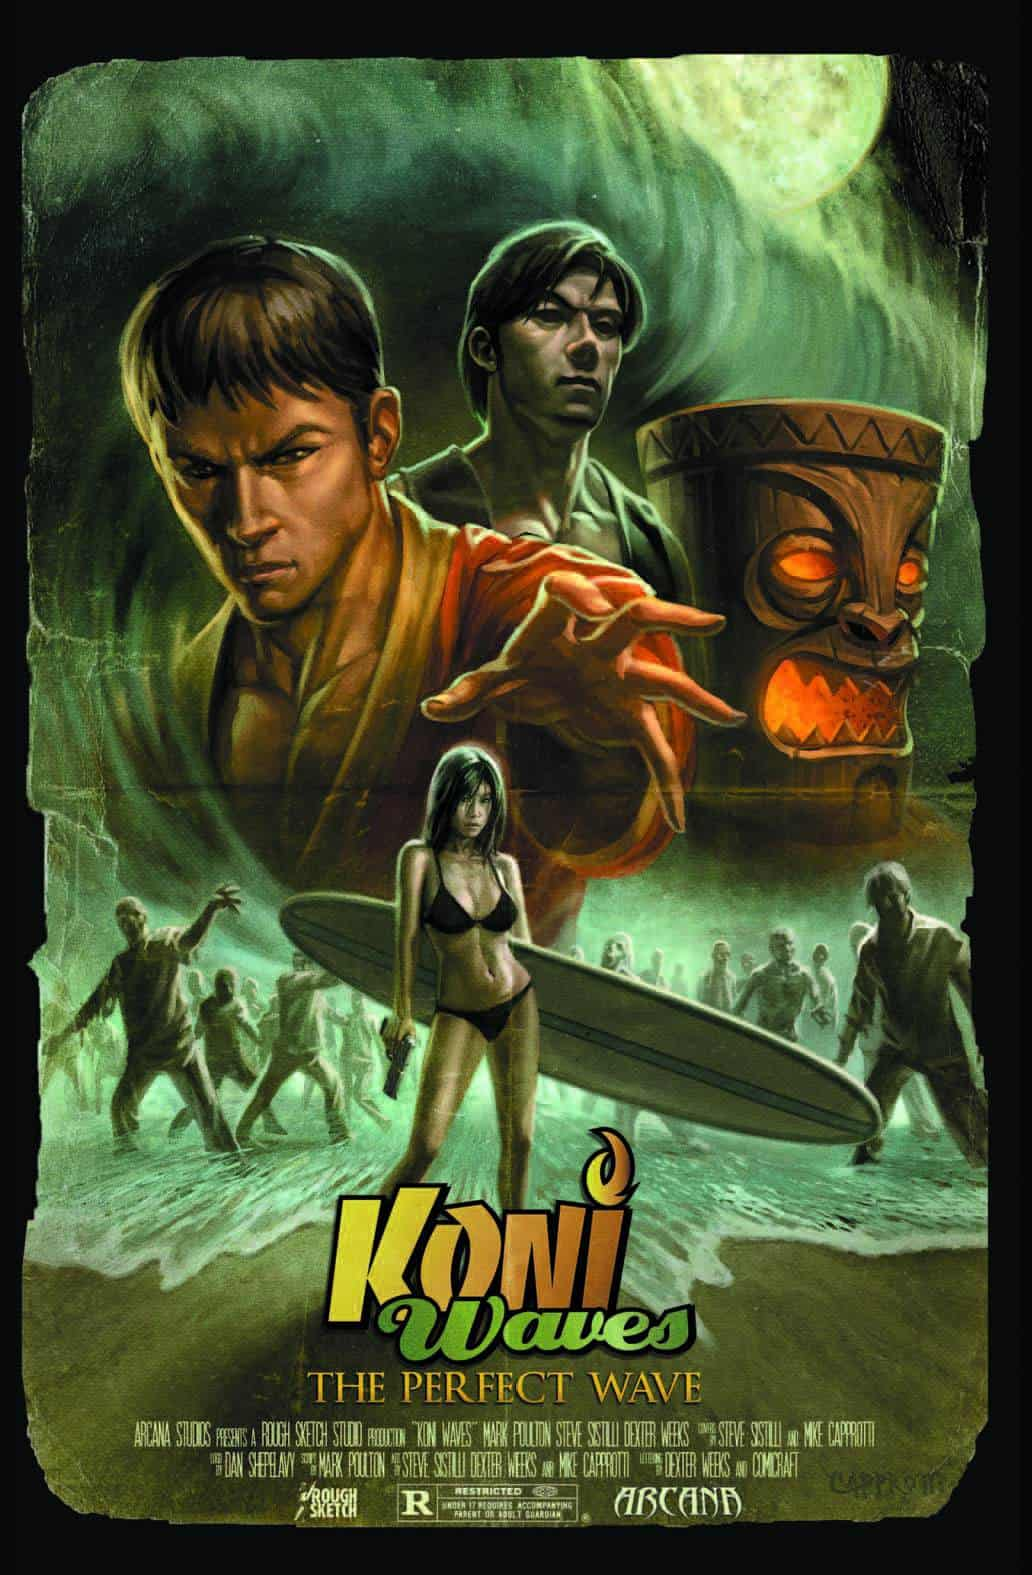 Koni Waves: The Perfect Wave